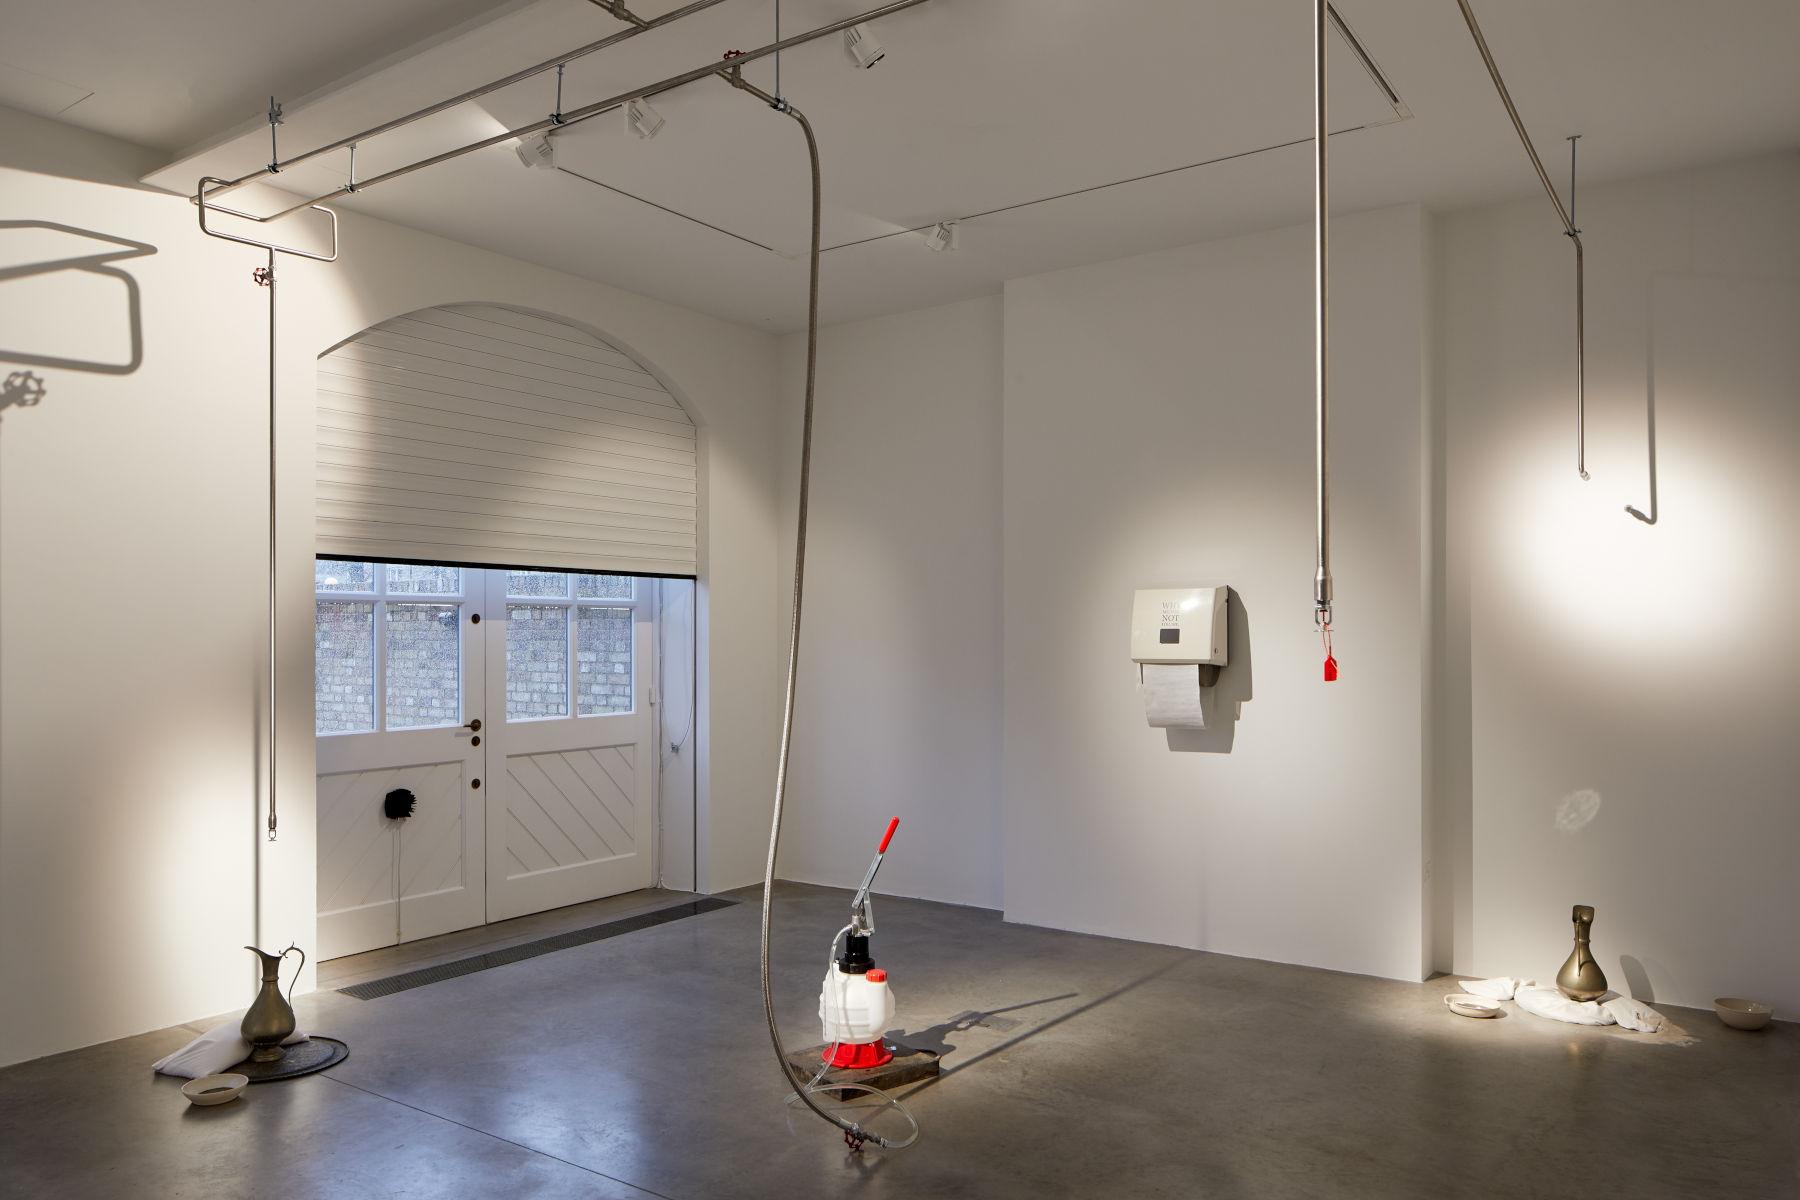 South London Gallery Fire Station Abbas Zahedi 1